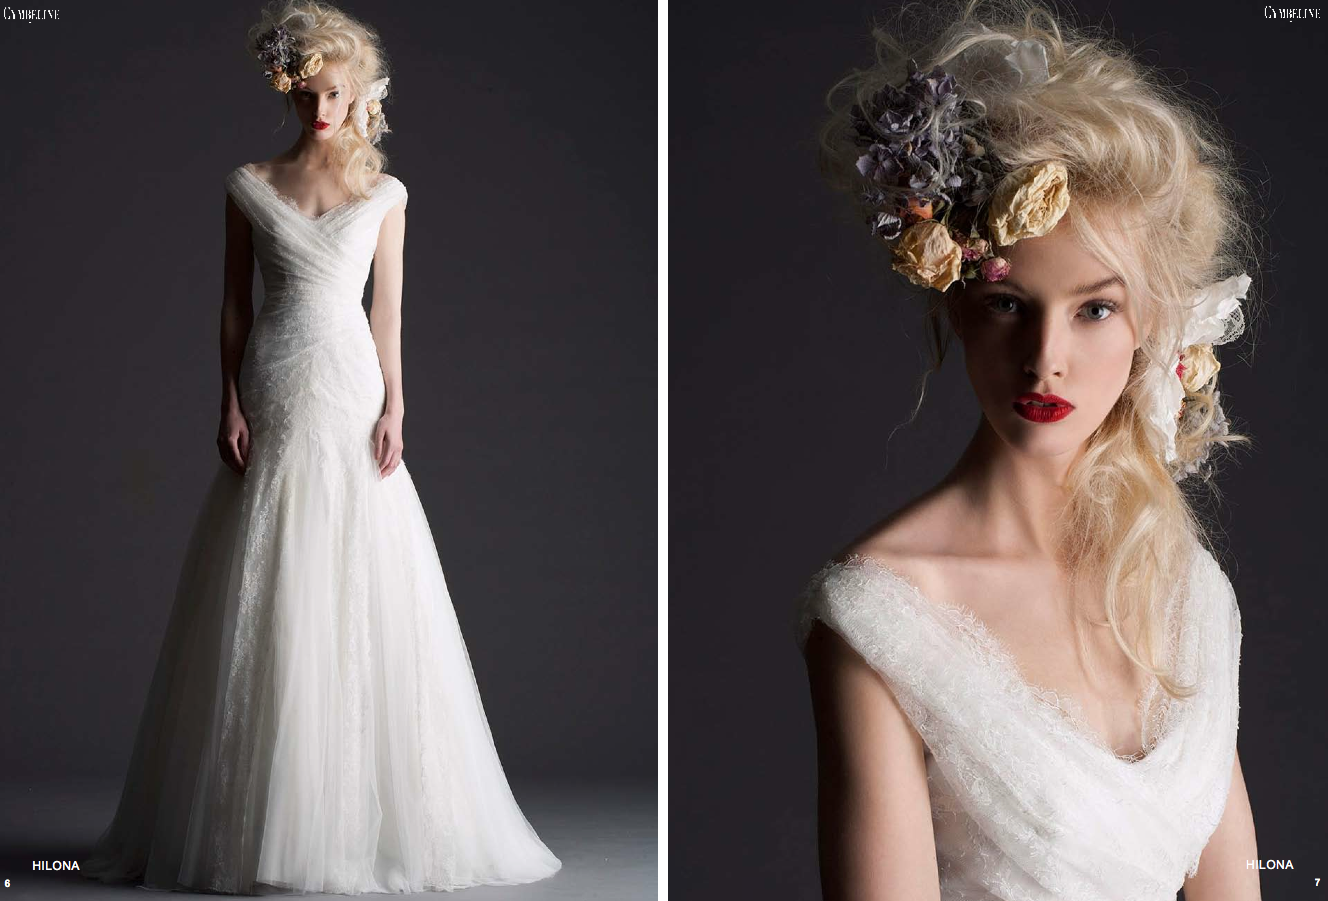 Cymbeline paris bridal 2014 wedding dress 1 for Wedding dress in paris